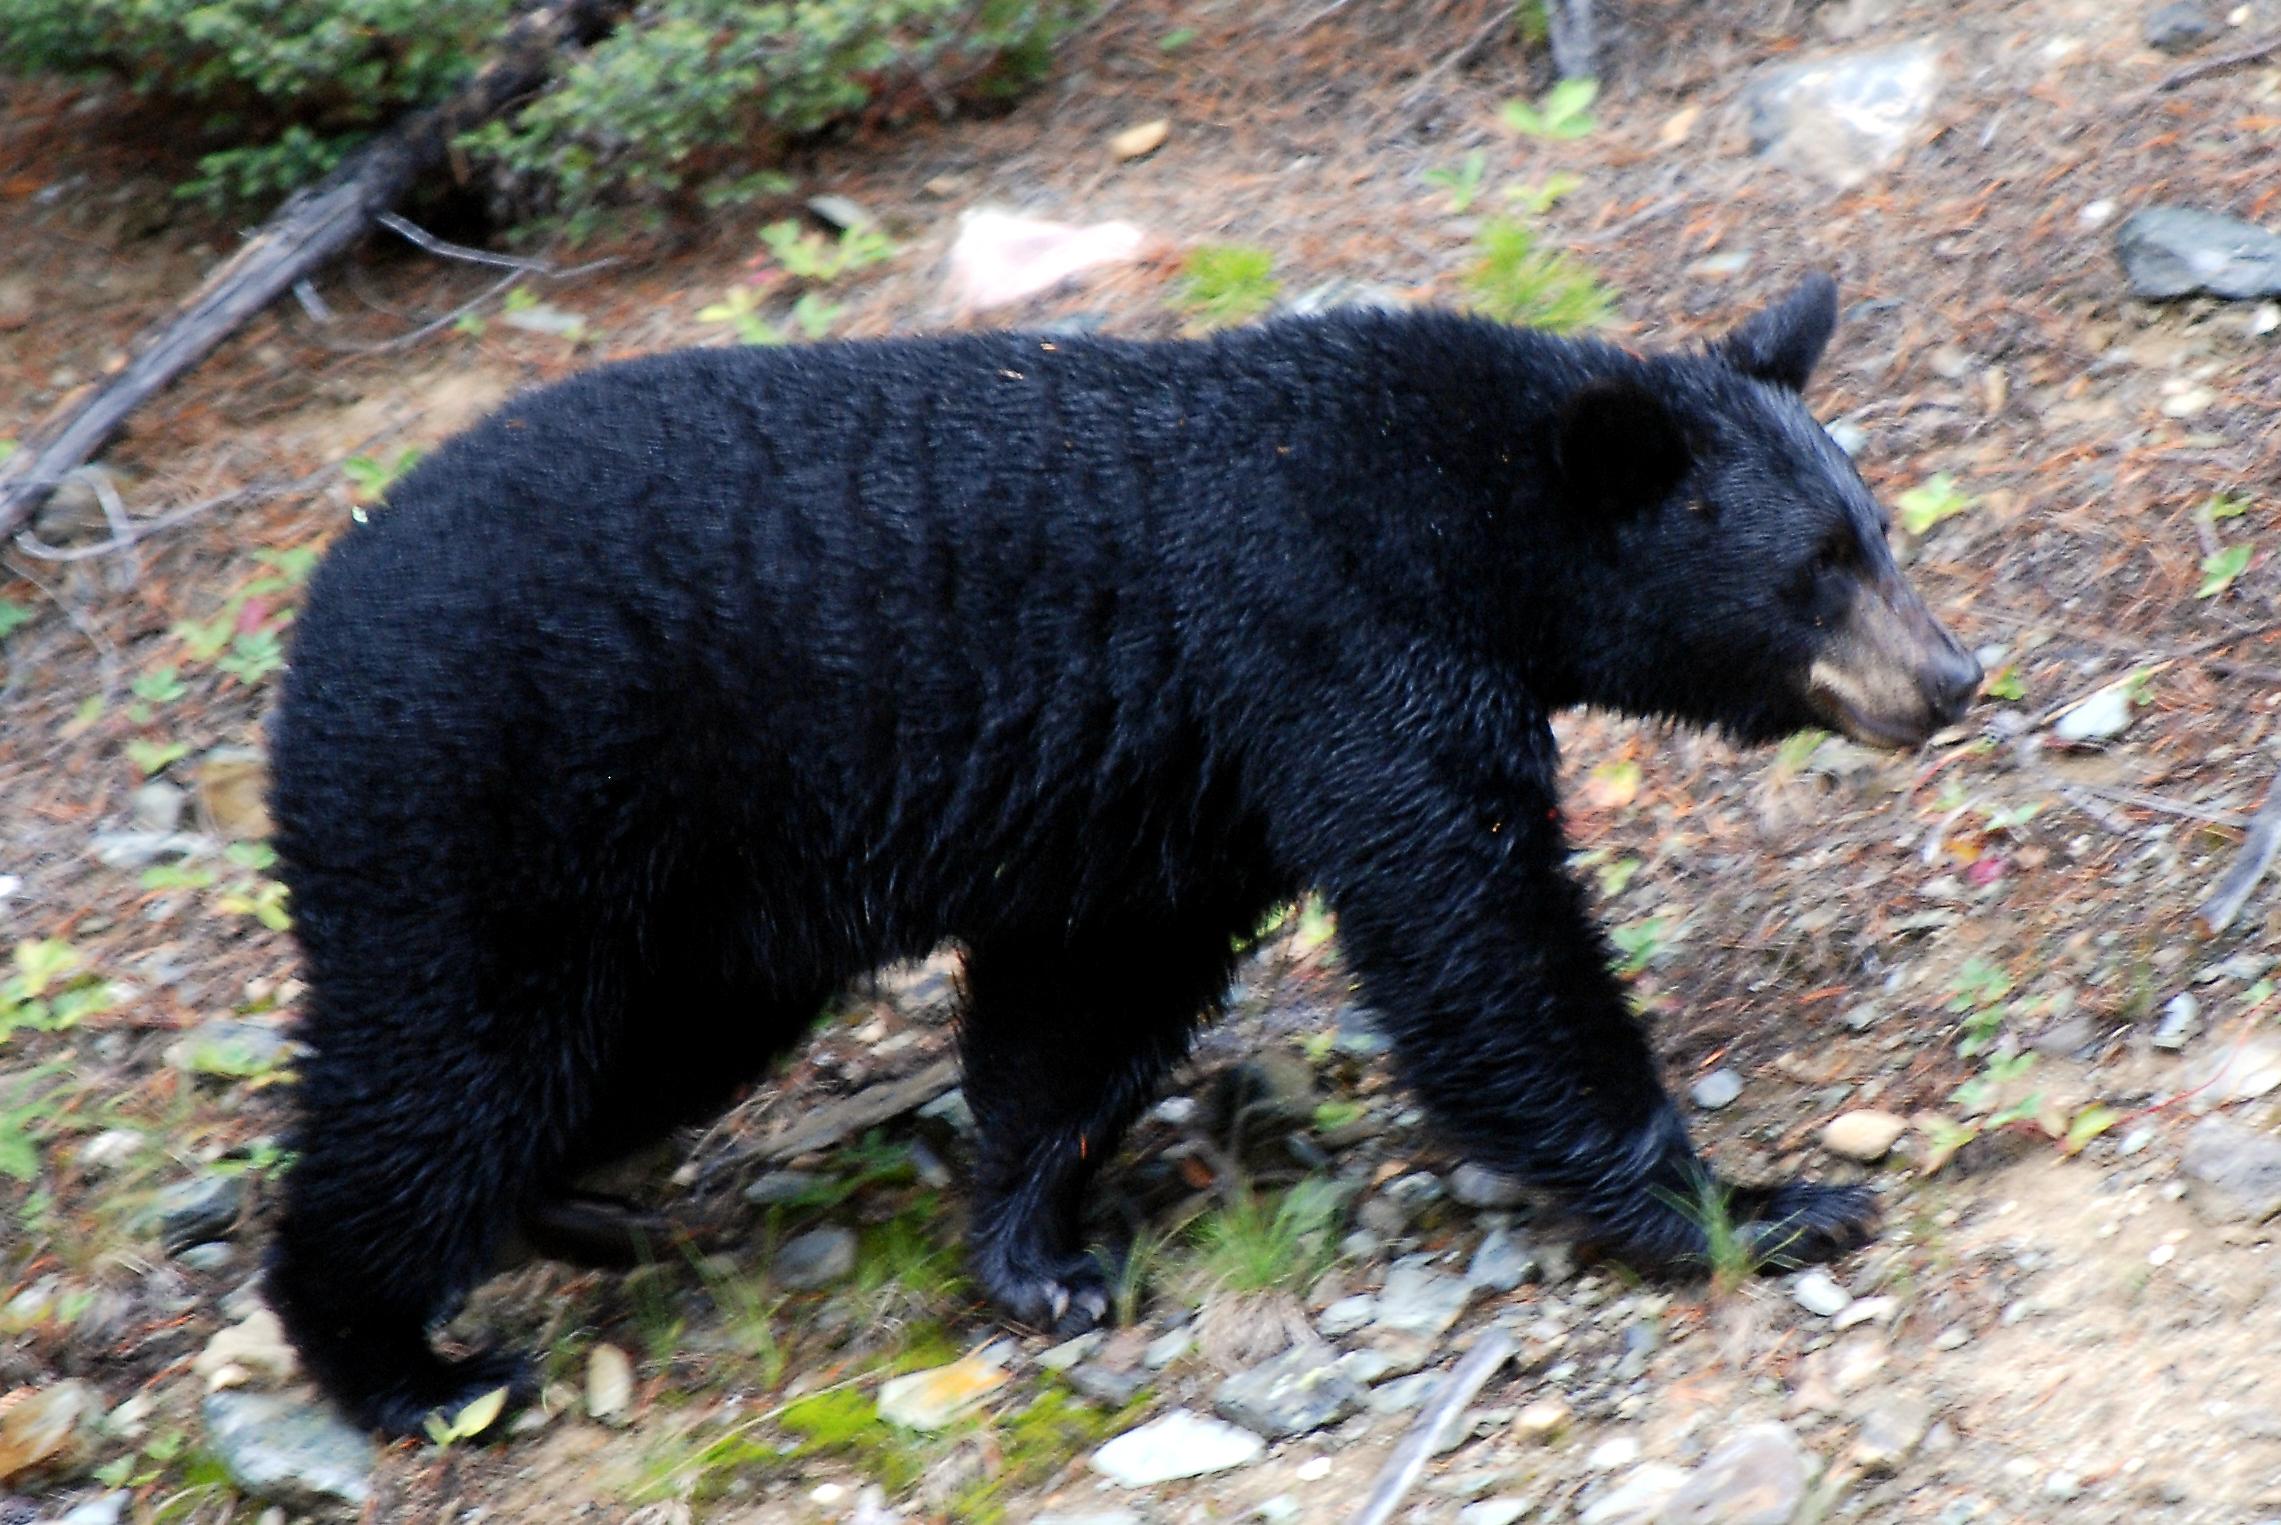 Grizzly Bear.animalia,chordata,mammalia,carnivora,caniformia,ursidae,bear,wild life,black bear